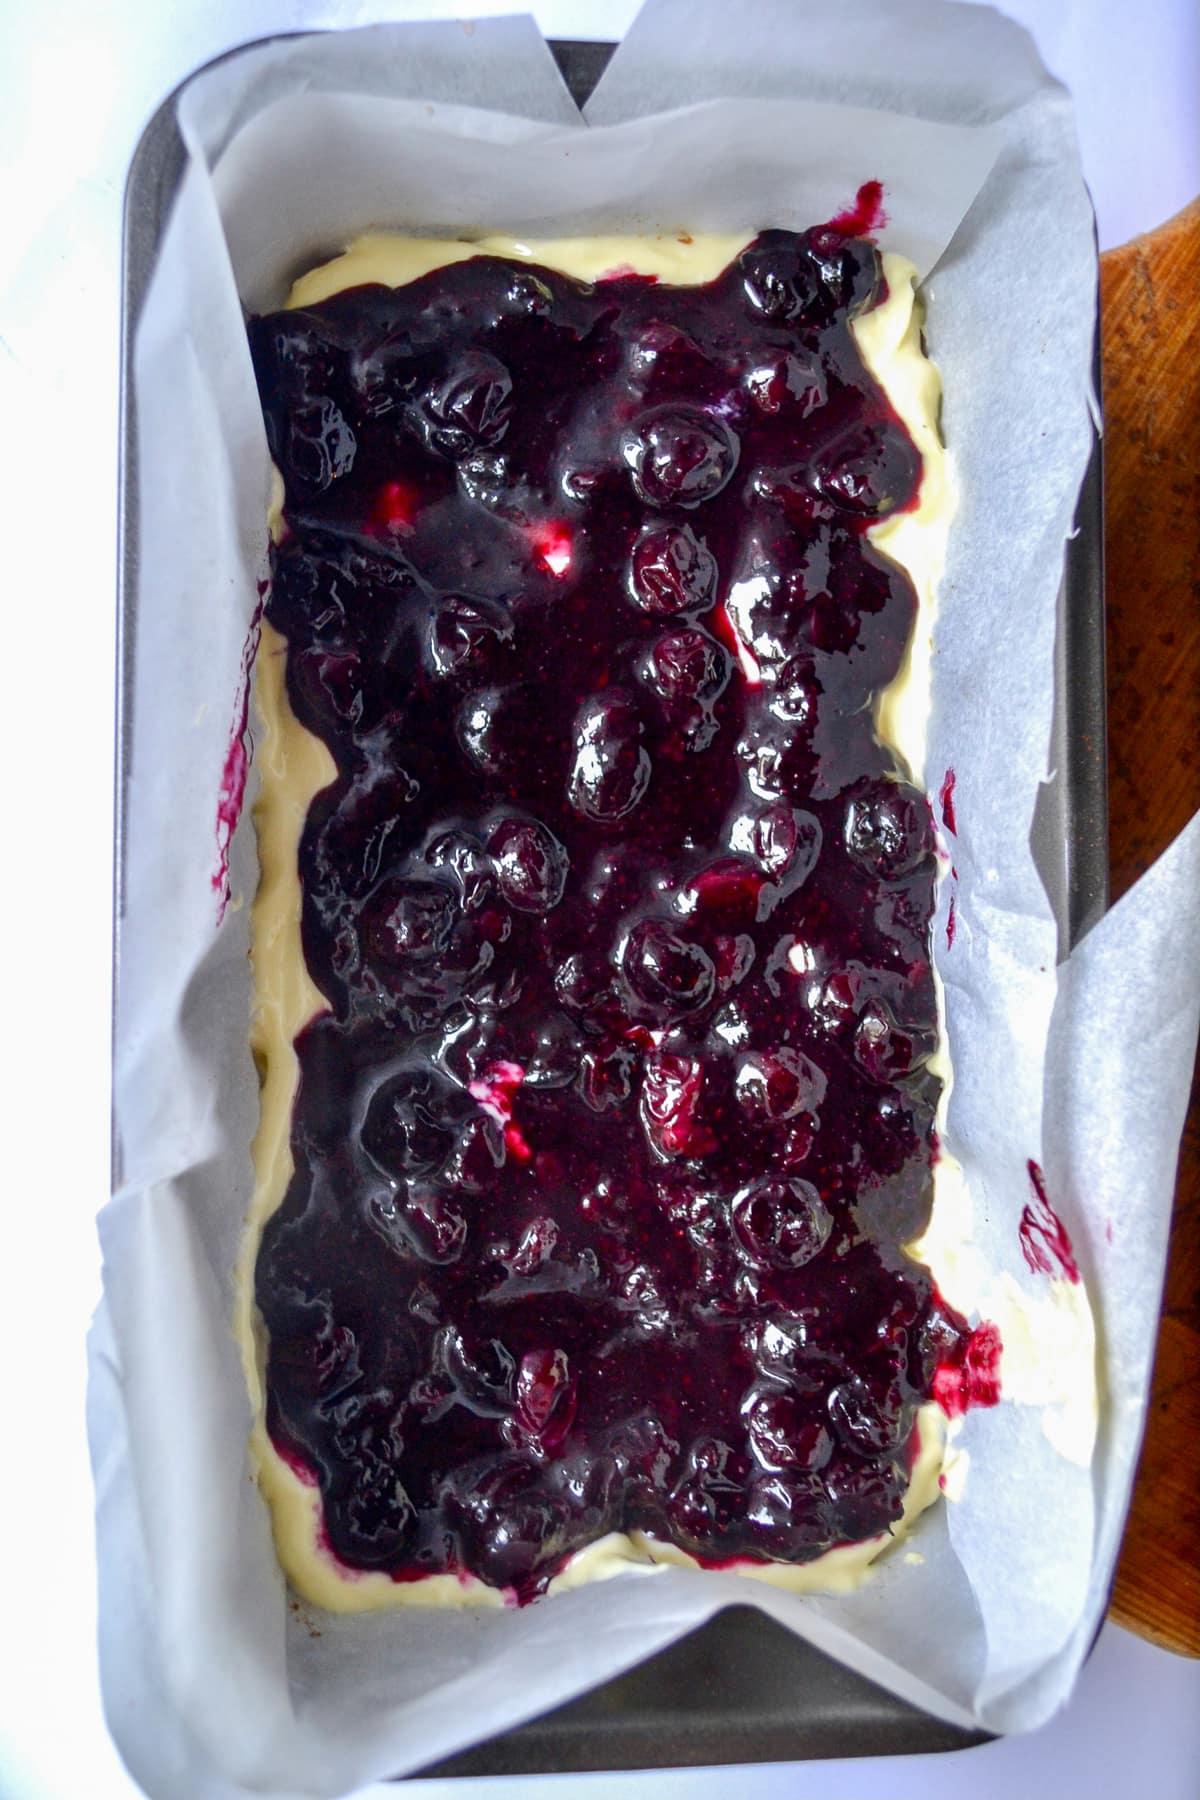 Keto Blueberry Lemon Cheesecake Bars prep